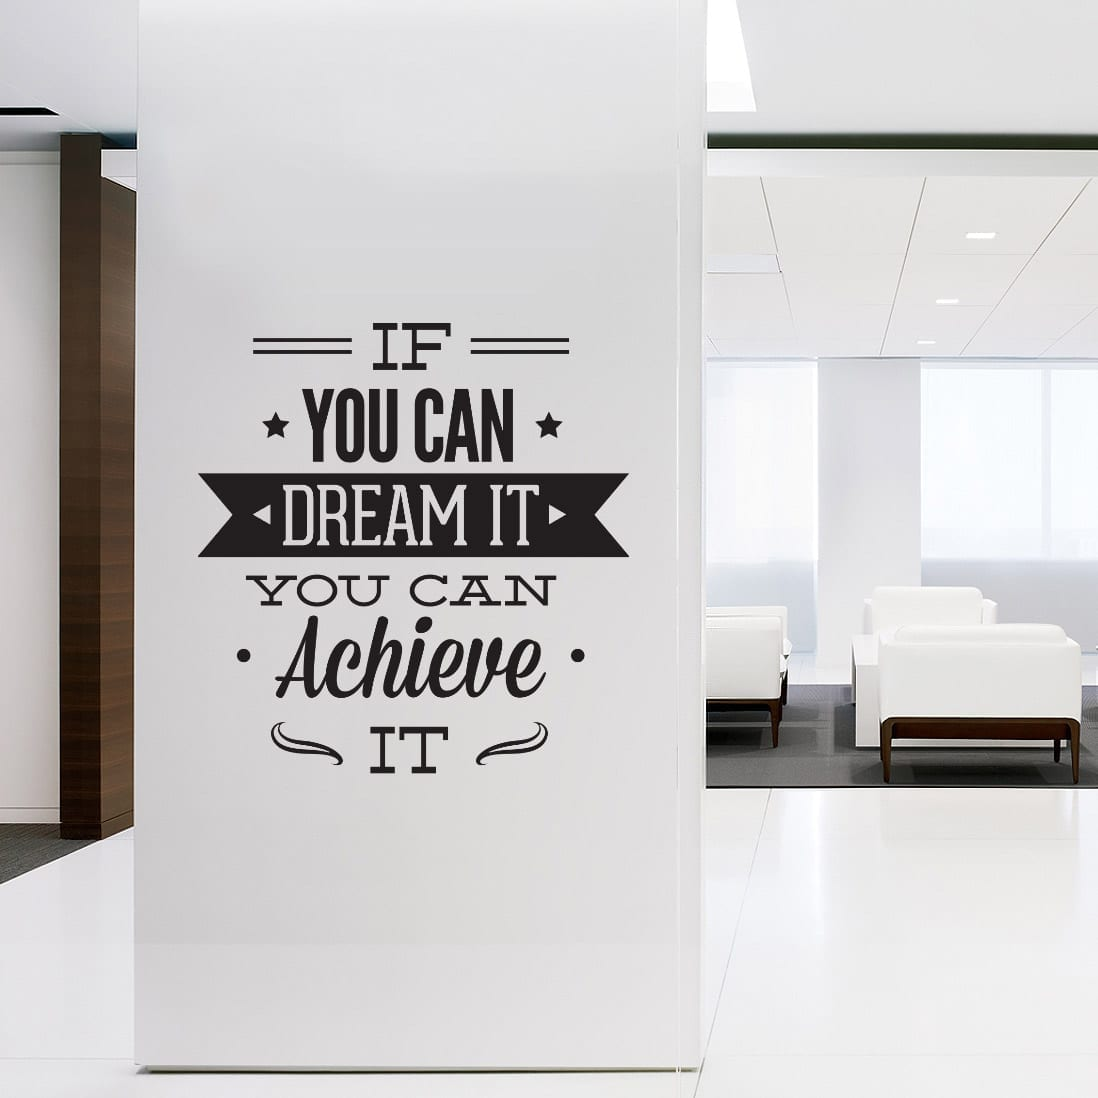 Dream it achieve it em vinil decorativo for Motivational quotes for office cubicle